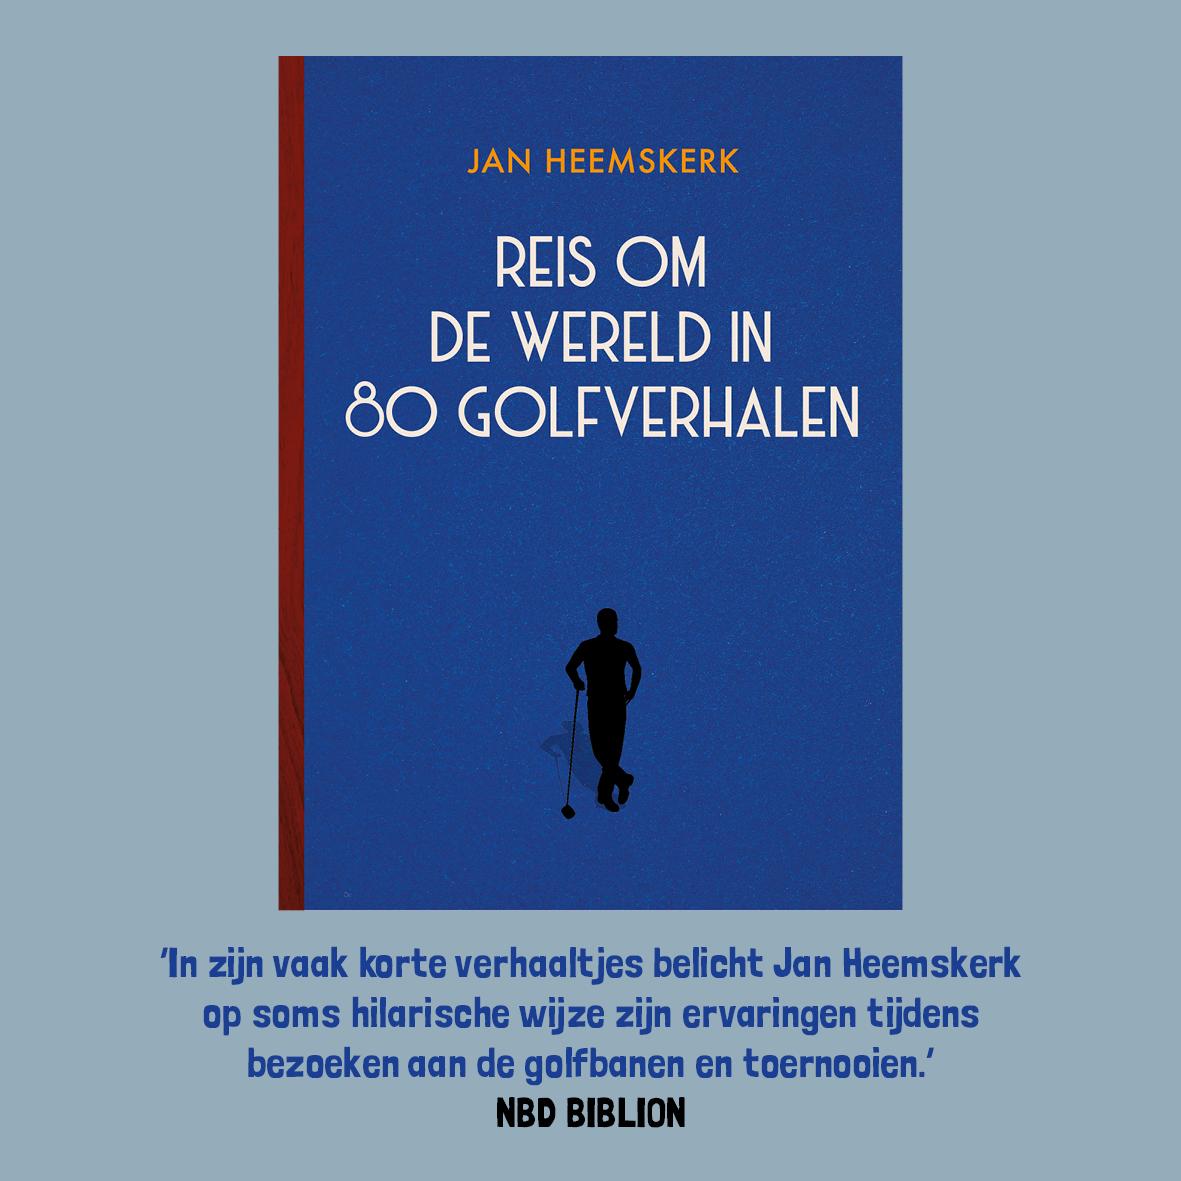 Jan Heemskerk NBD Biblion